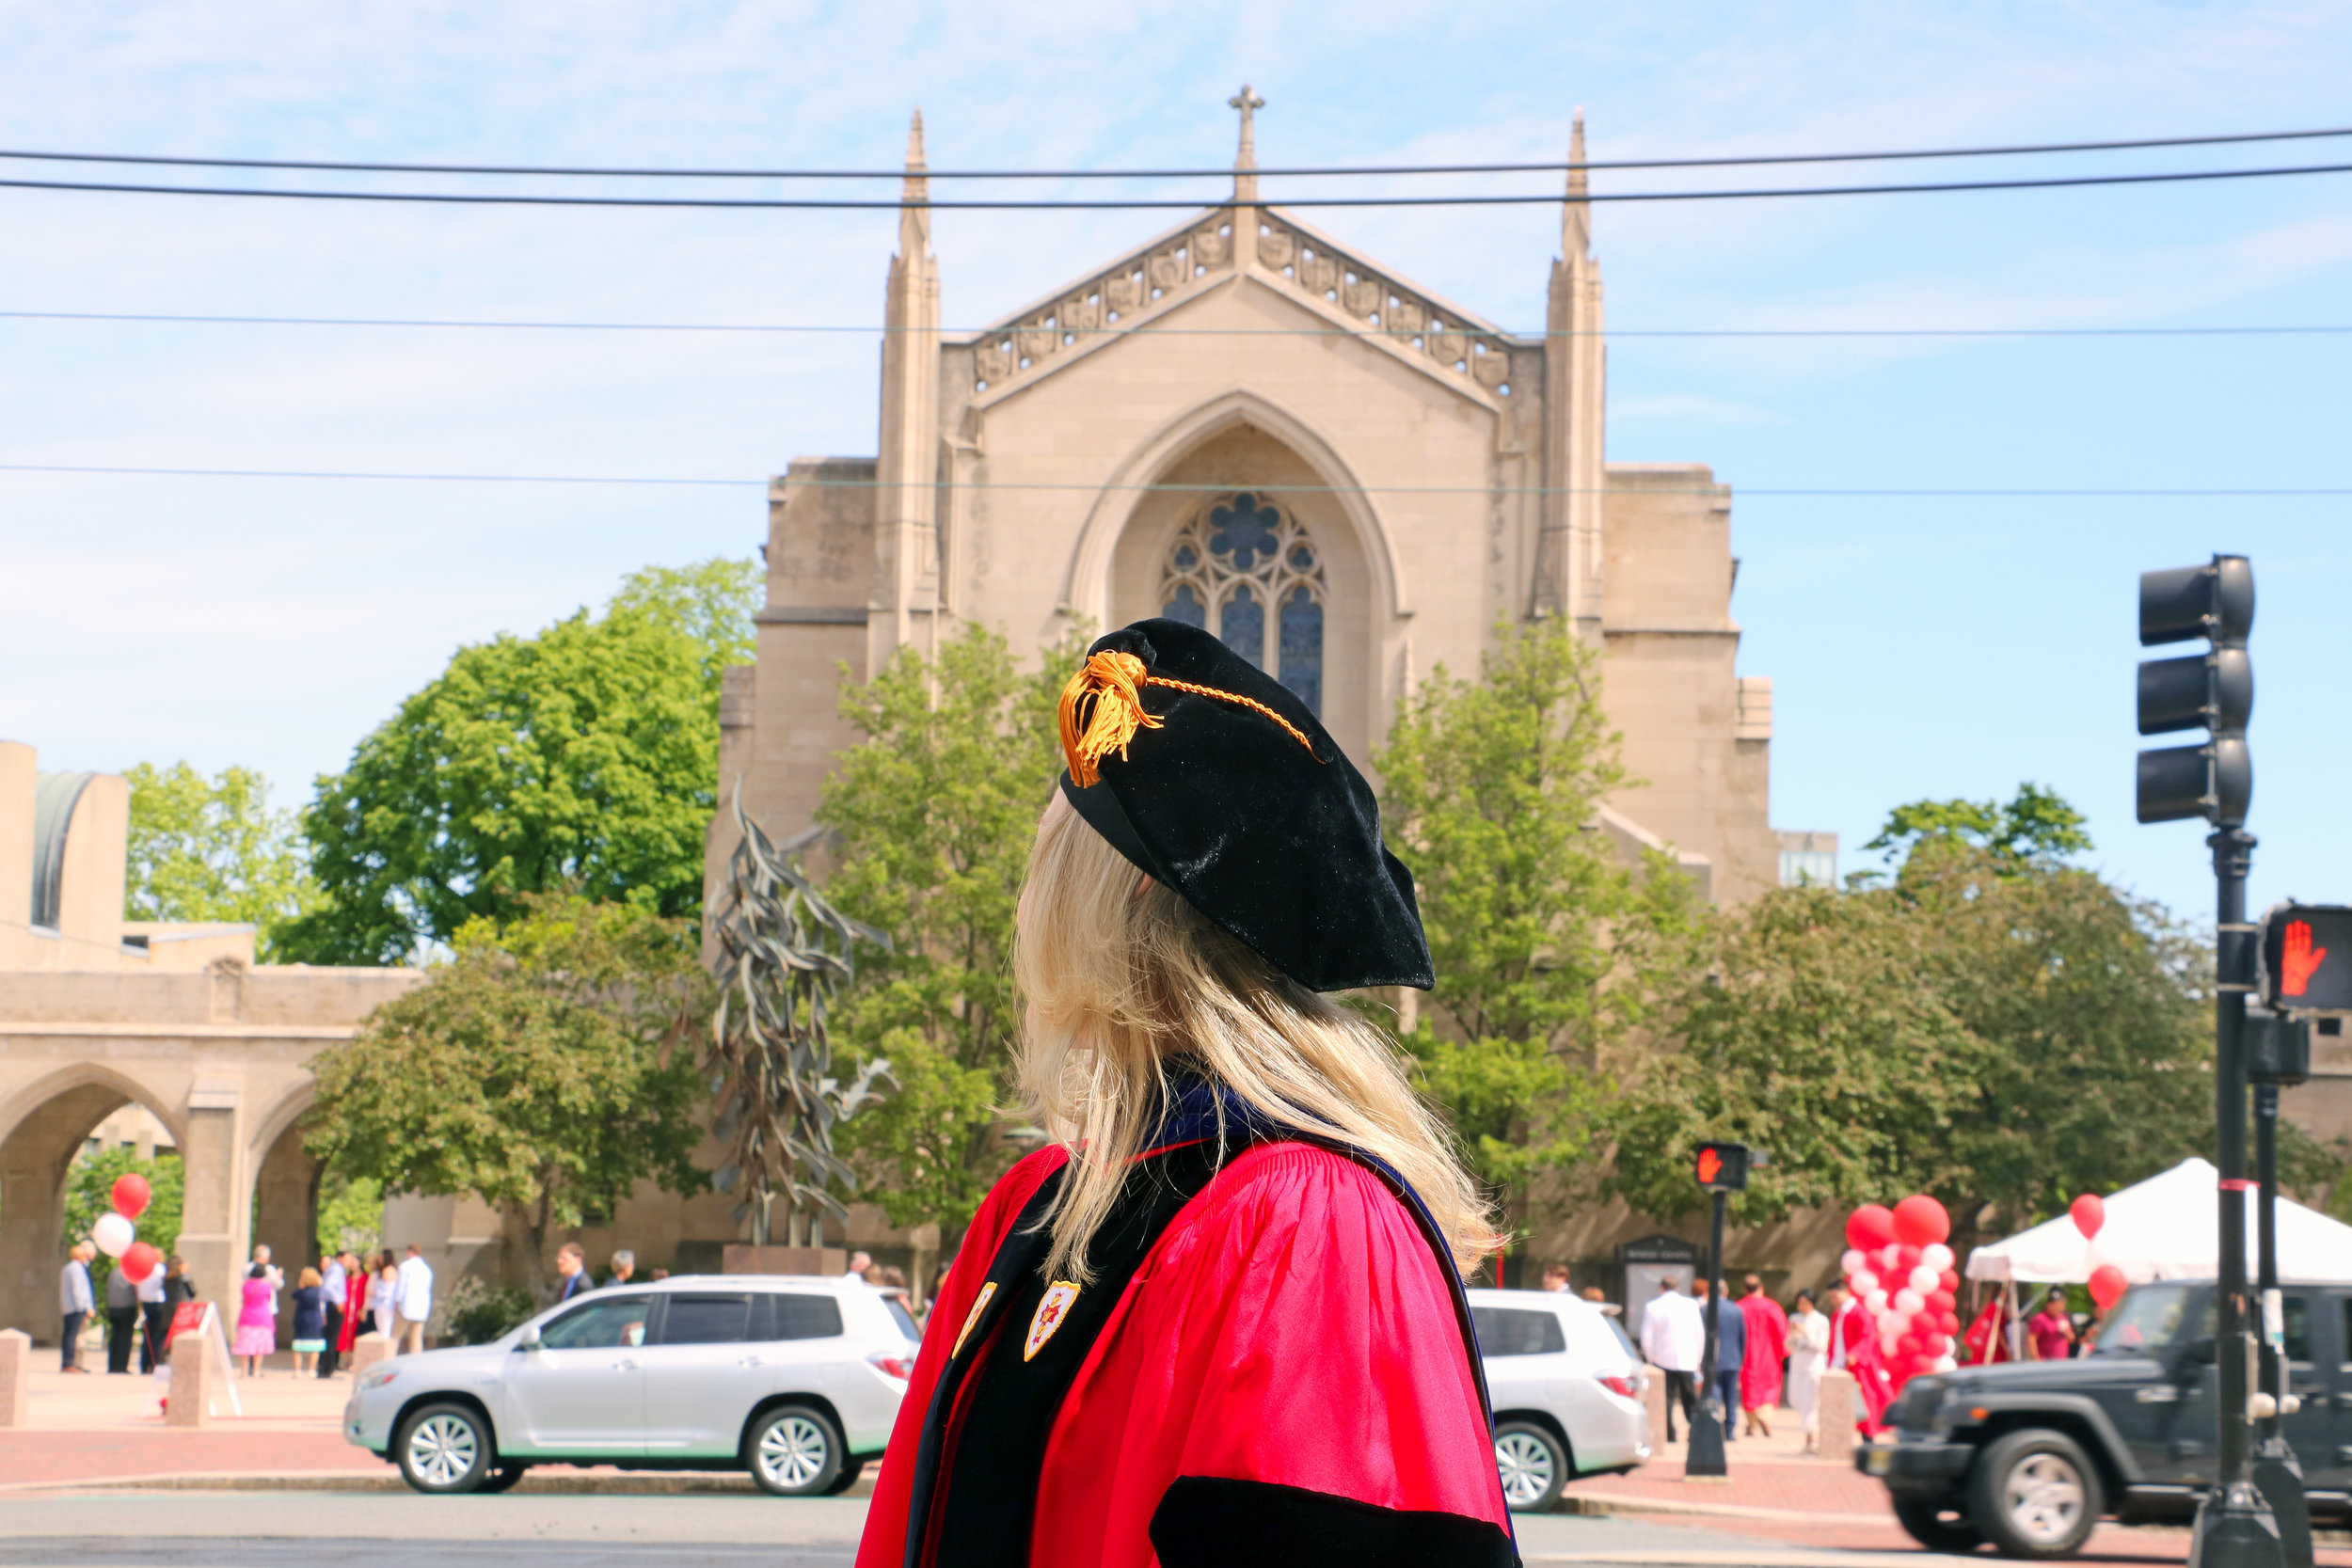 Reflecting back on my time at Boston University.